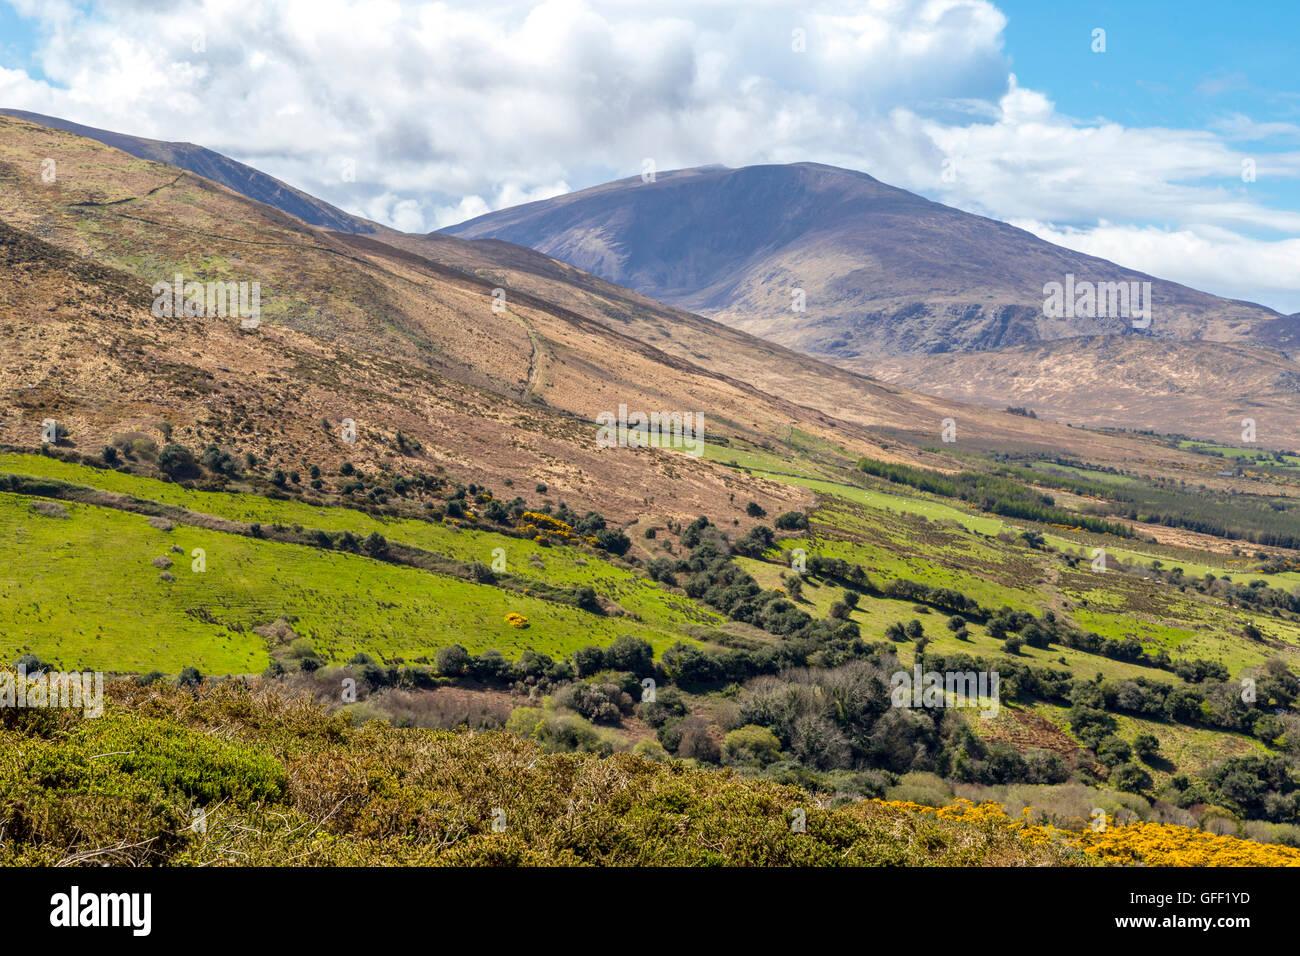 Scenic landscape beauty, Dunquin, Dingle Peninsula, County Kerry, Munster Province, Republic of Ireland. Stock Photo